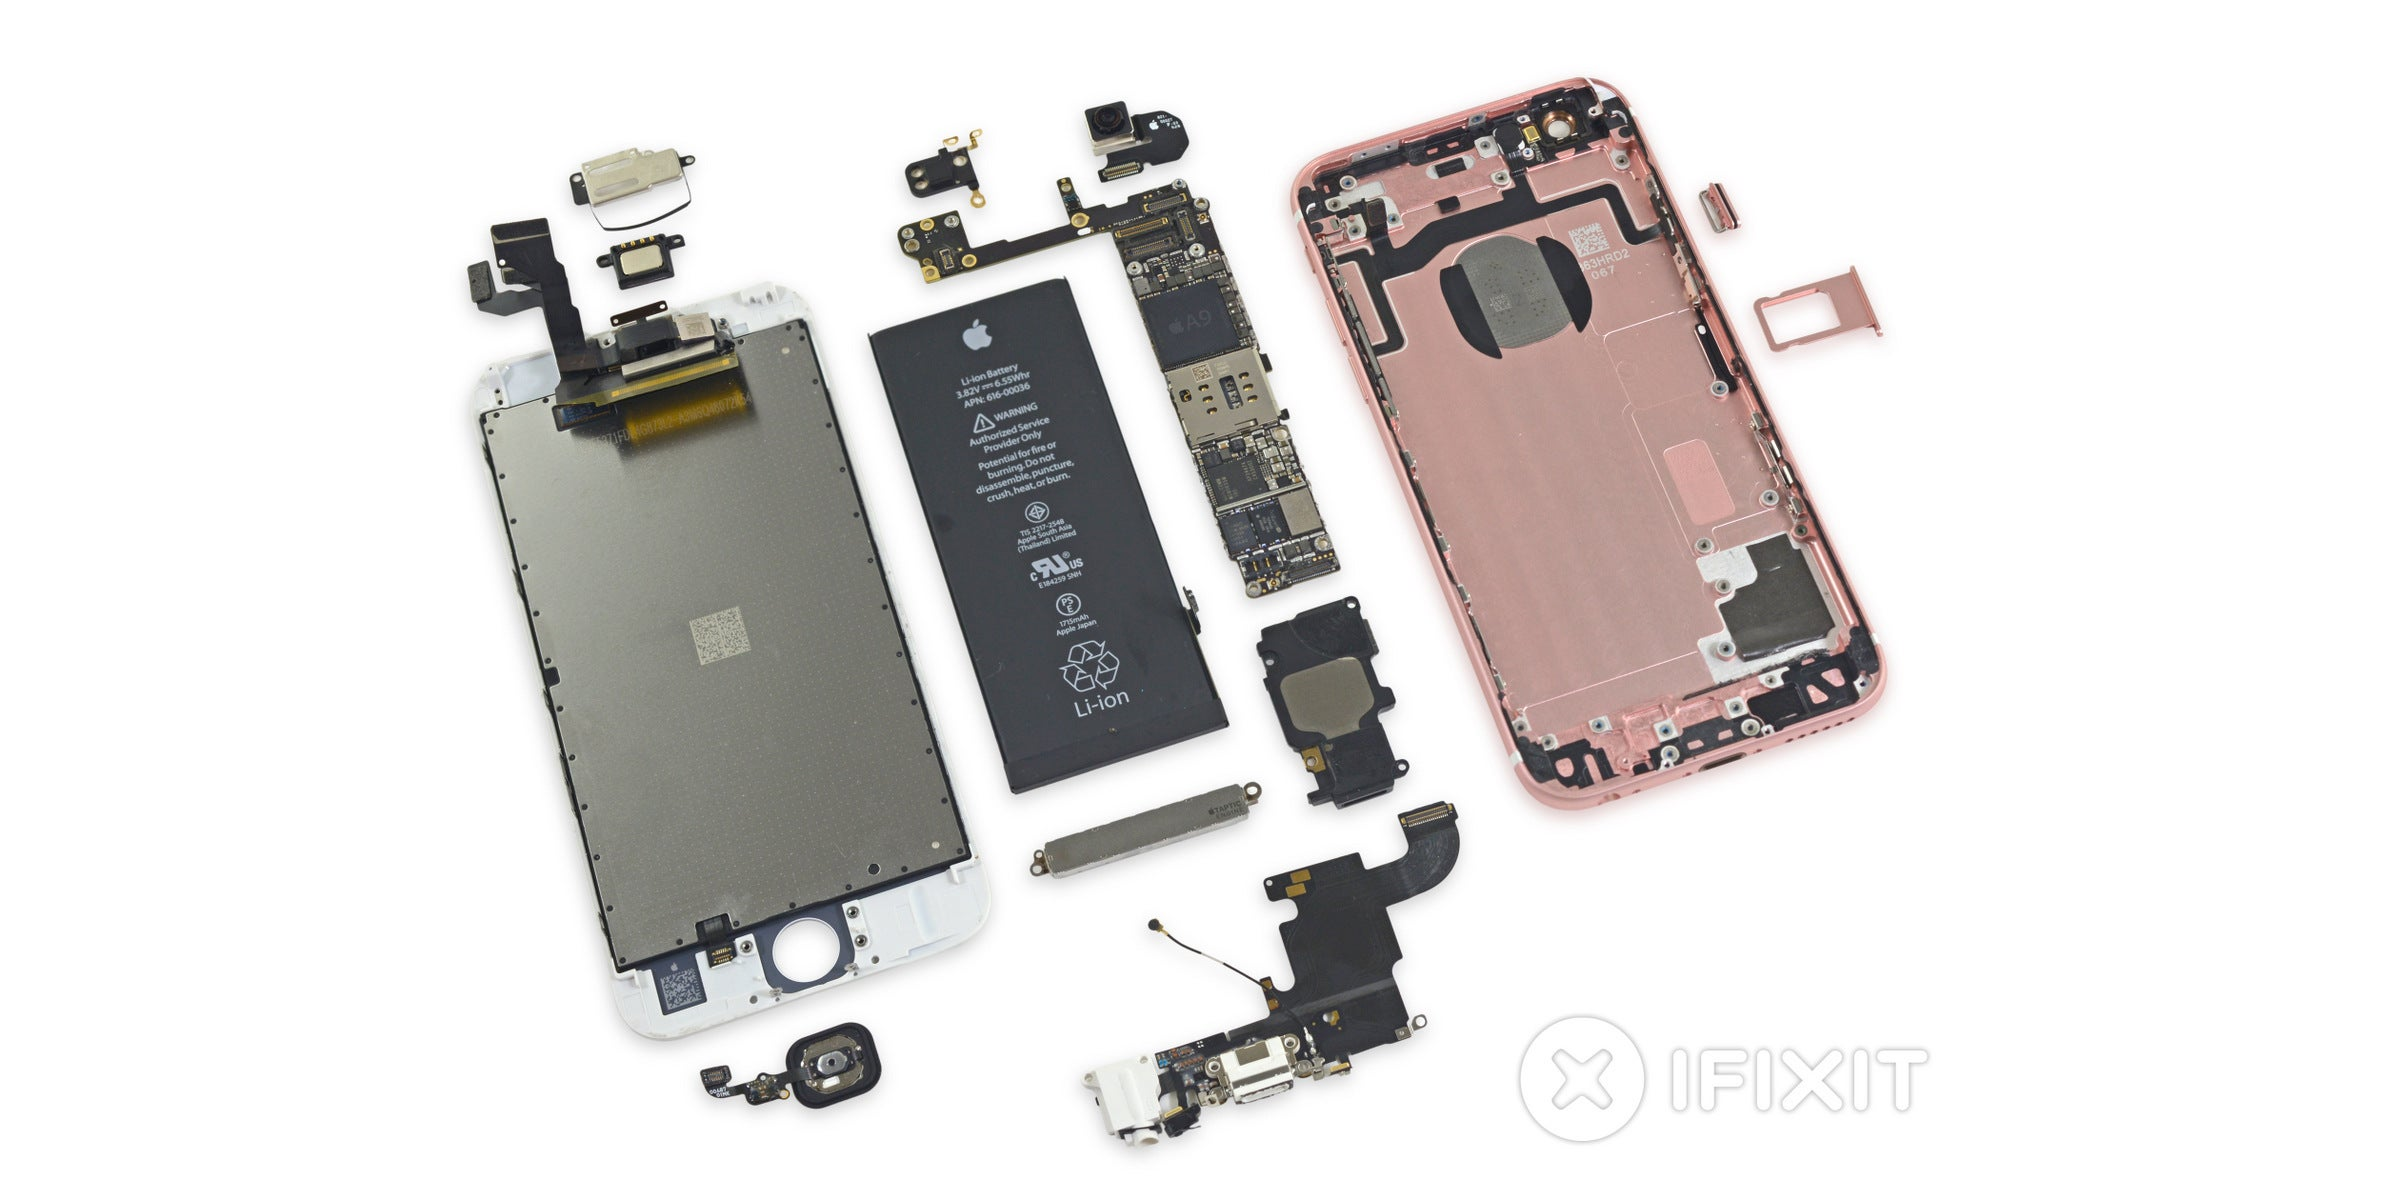 iPhone 6S Teardown: Smaller Battery, Heavier Display, Kinda Repairable